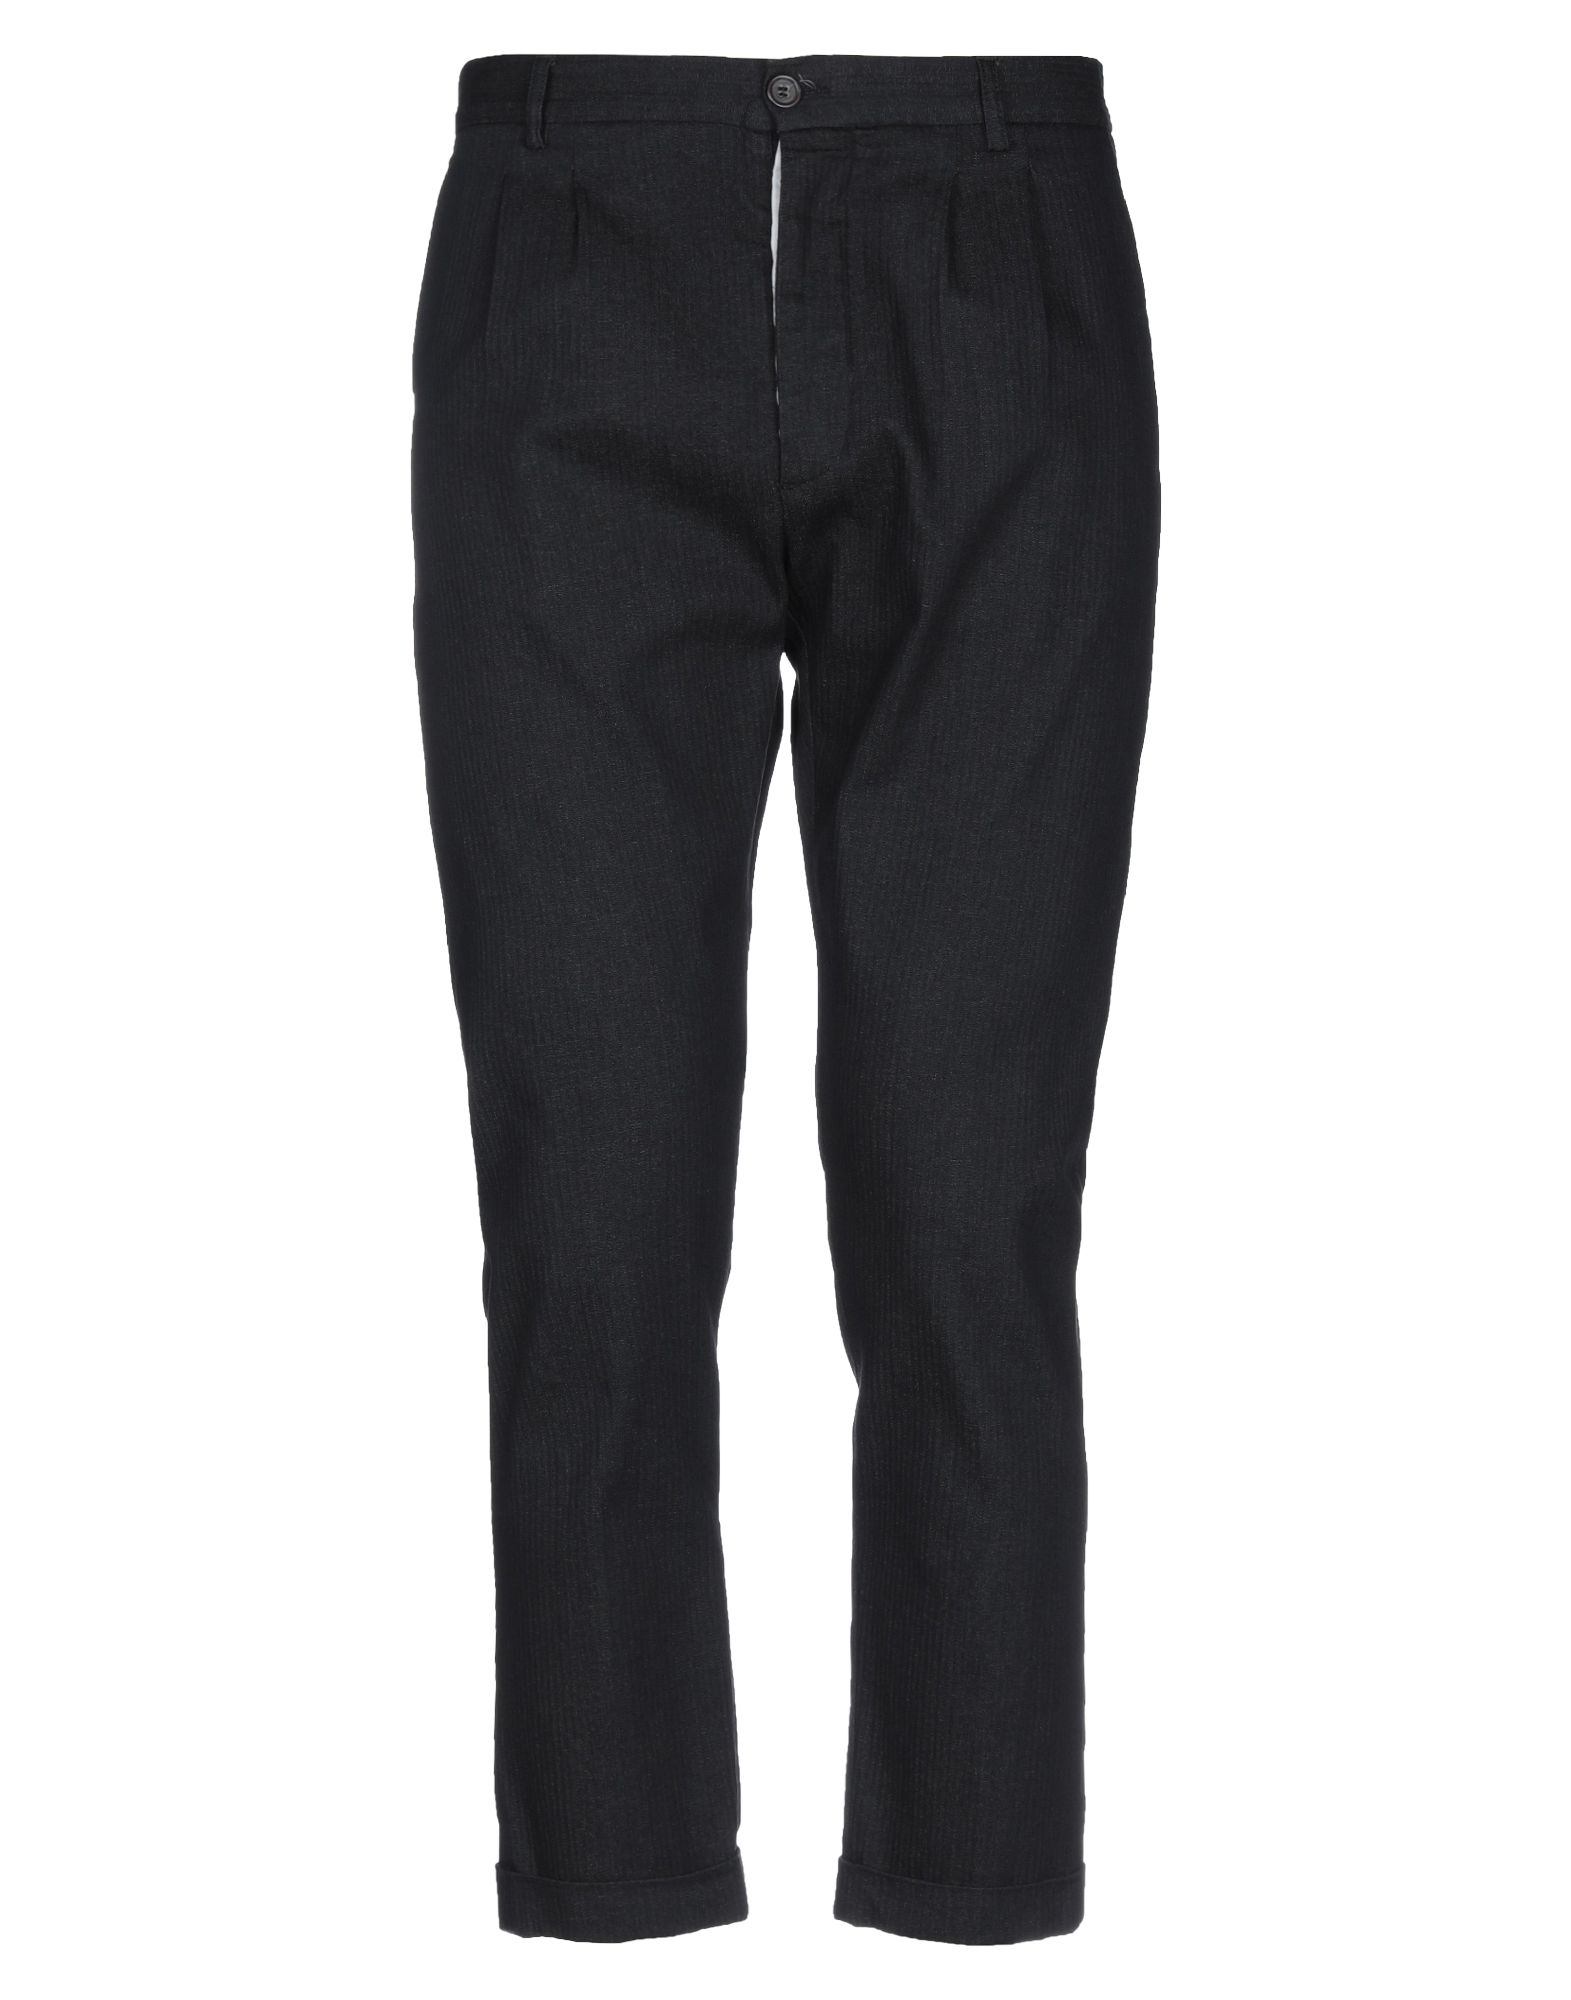 Фото - LA SARTORIA per TRUE NYC® Повседневные брюки sartoria toscana повседневные брюки